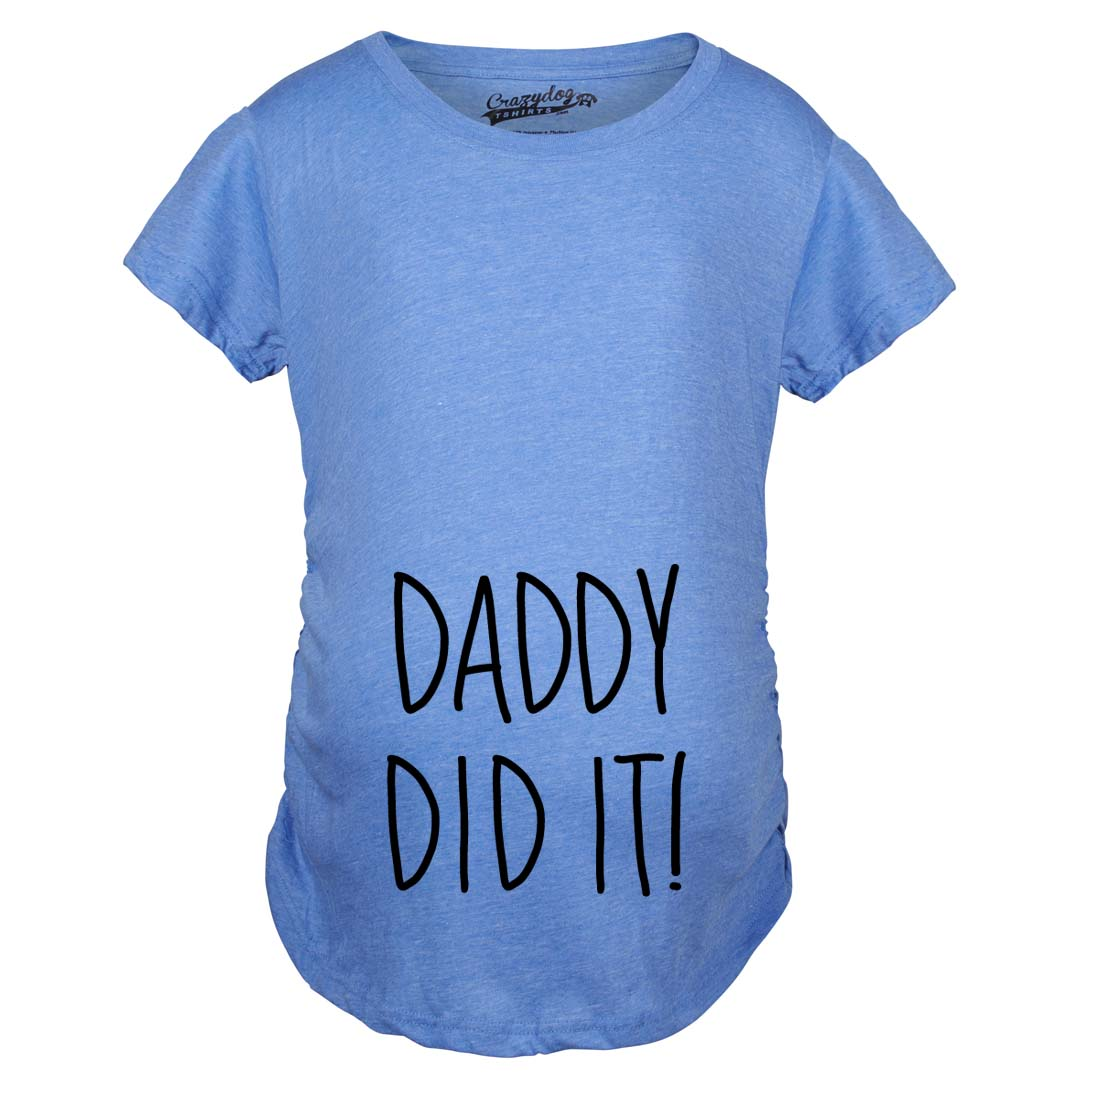 maternity daddy did it cute shirt funny pregnancy t shirts